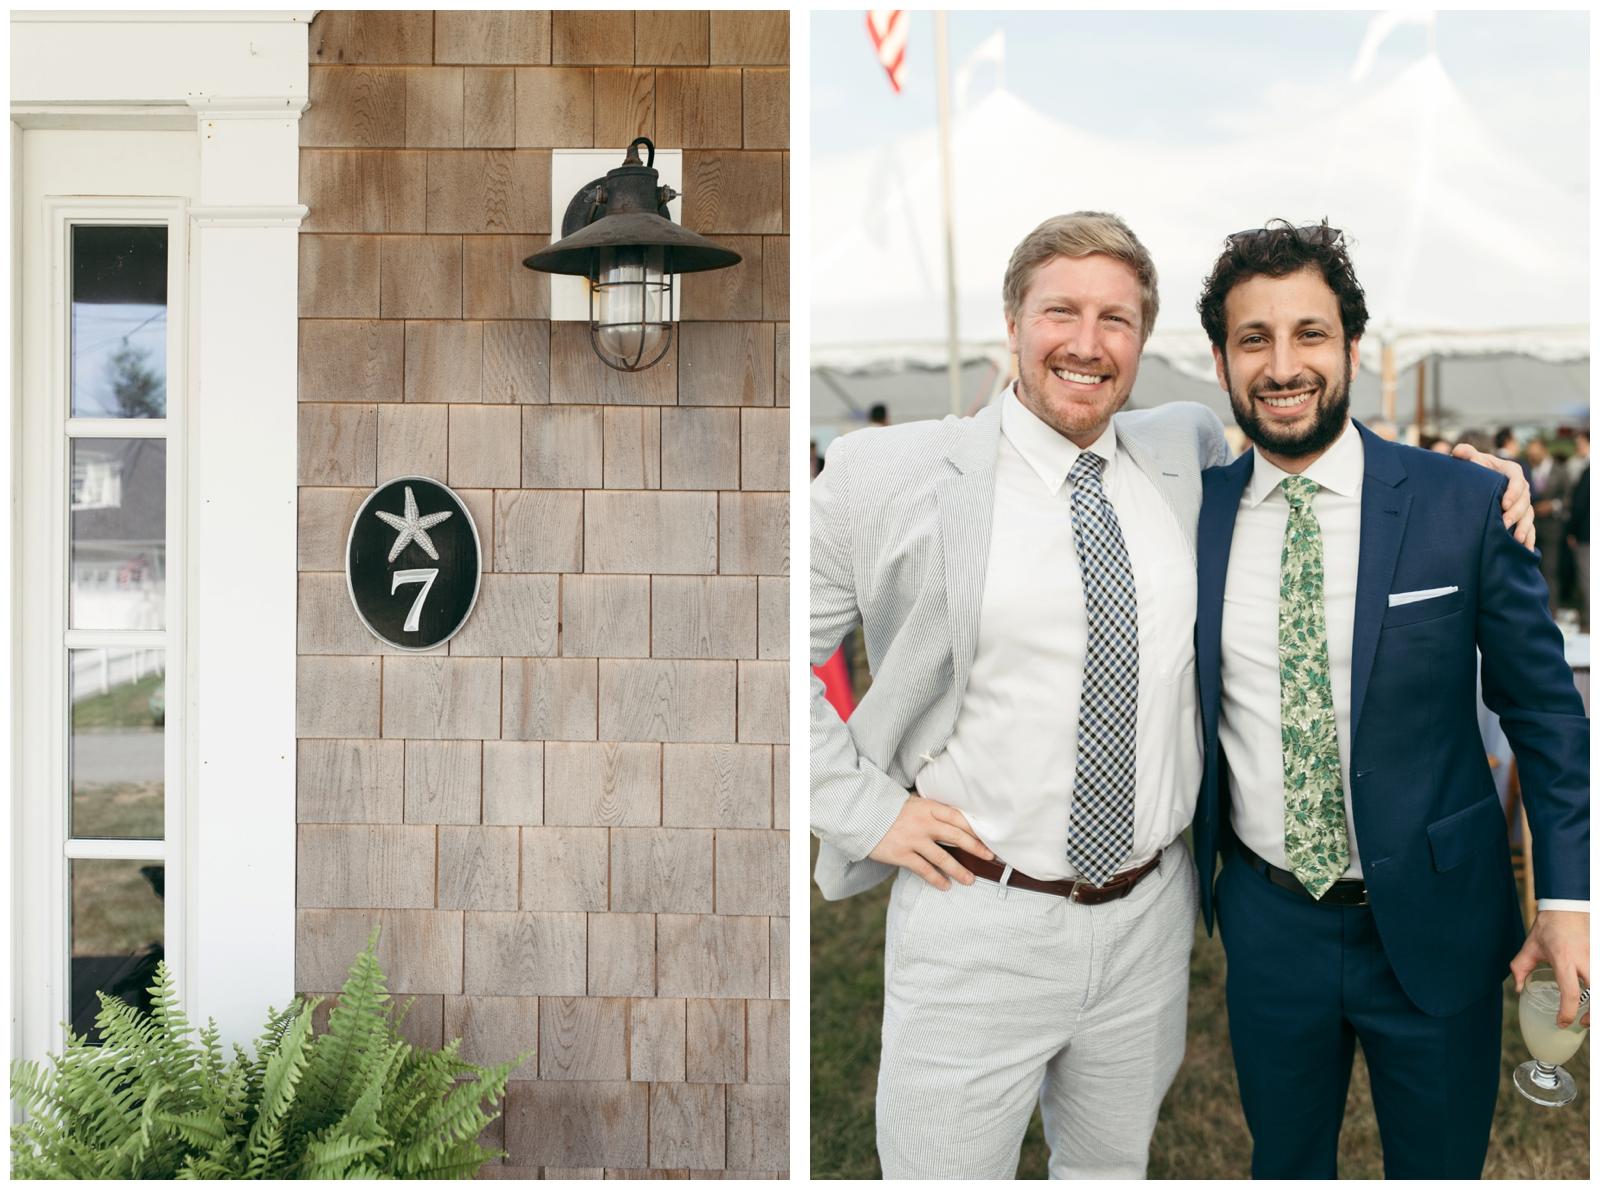 Bailey-Q-Photo-Backyard-Wedding-South-Shore-Boston-Wedding-Photographer-073.jpg